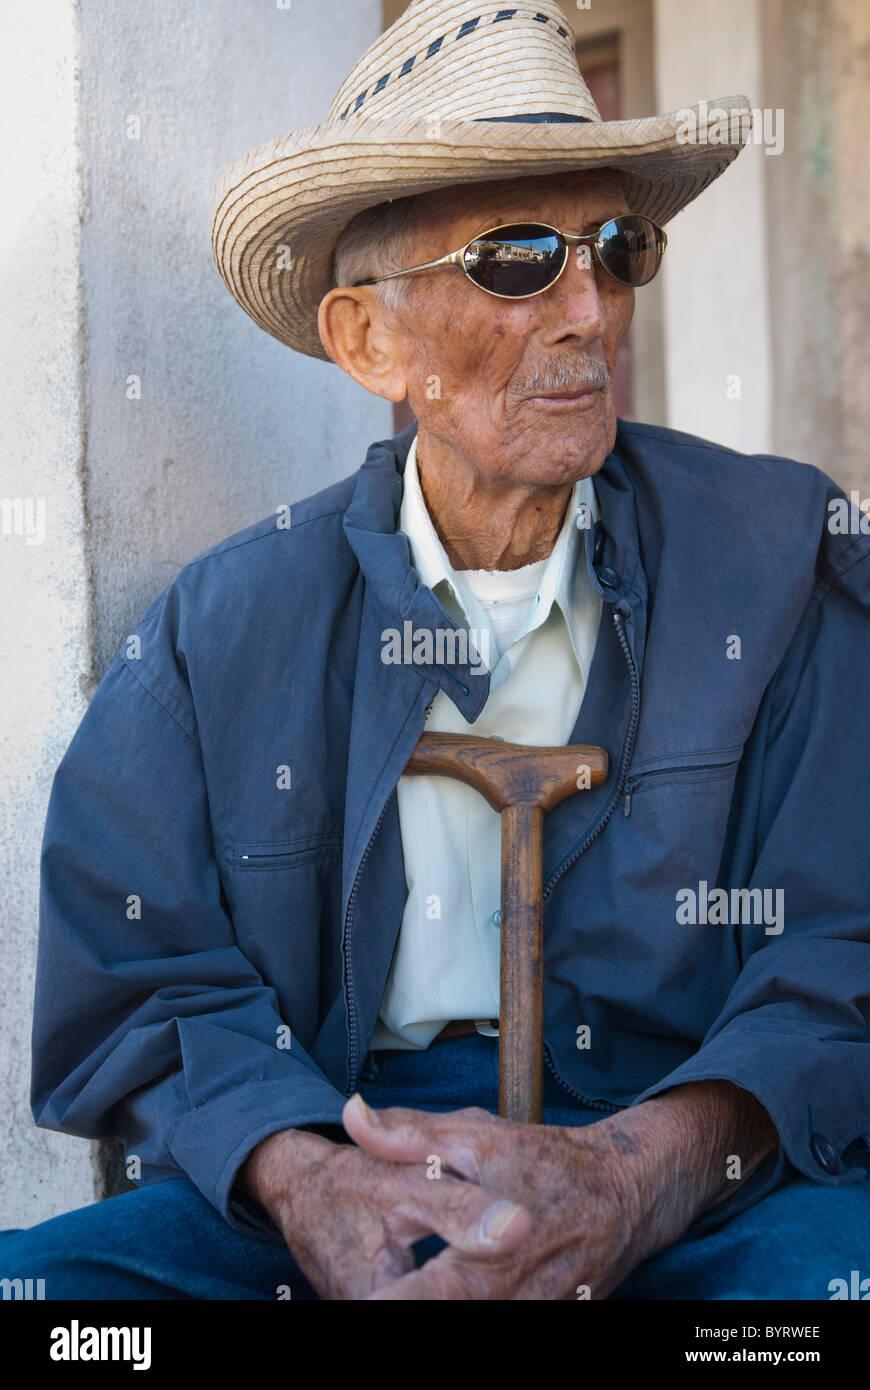 how to buy fast delivery first rate Vieil homme à chapeau de cowboy, Palmira, Cienfuegos, Cuba ...